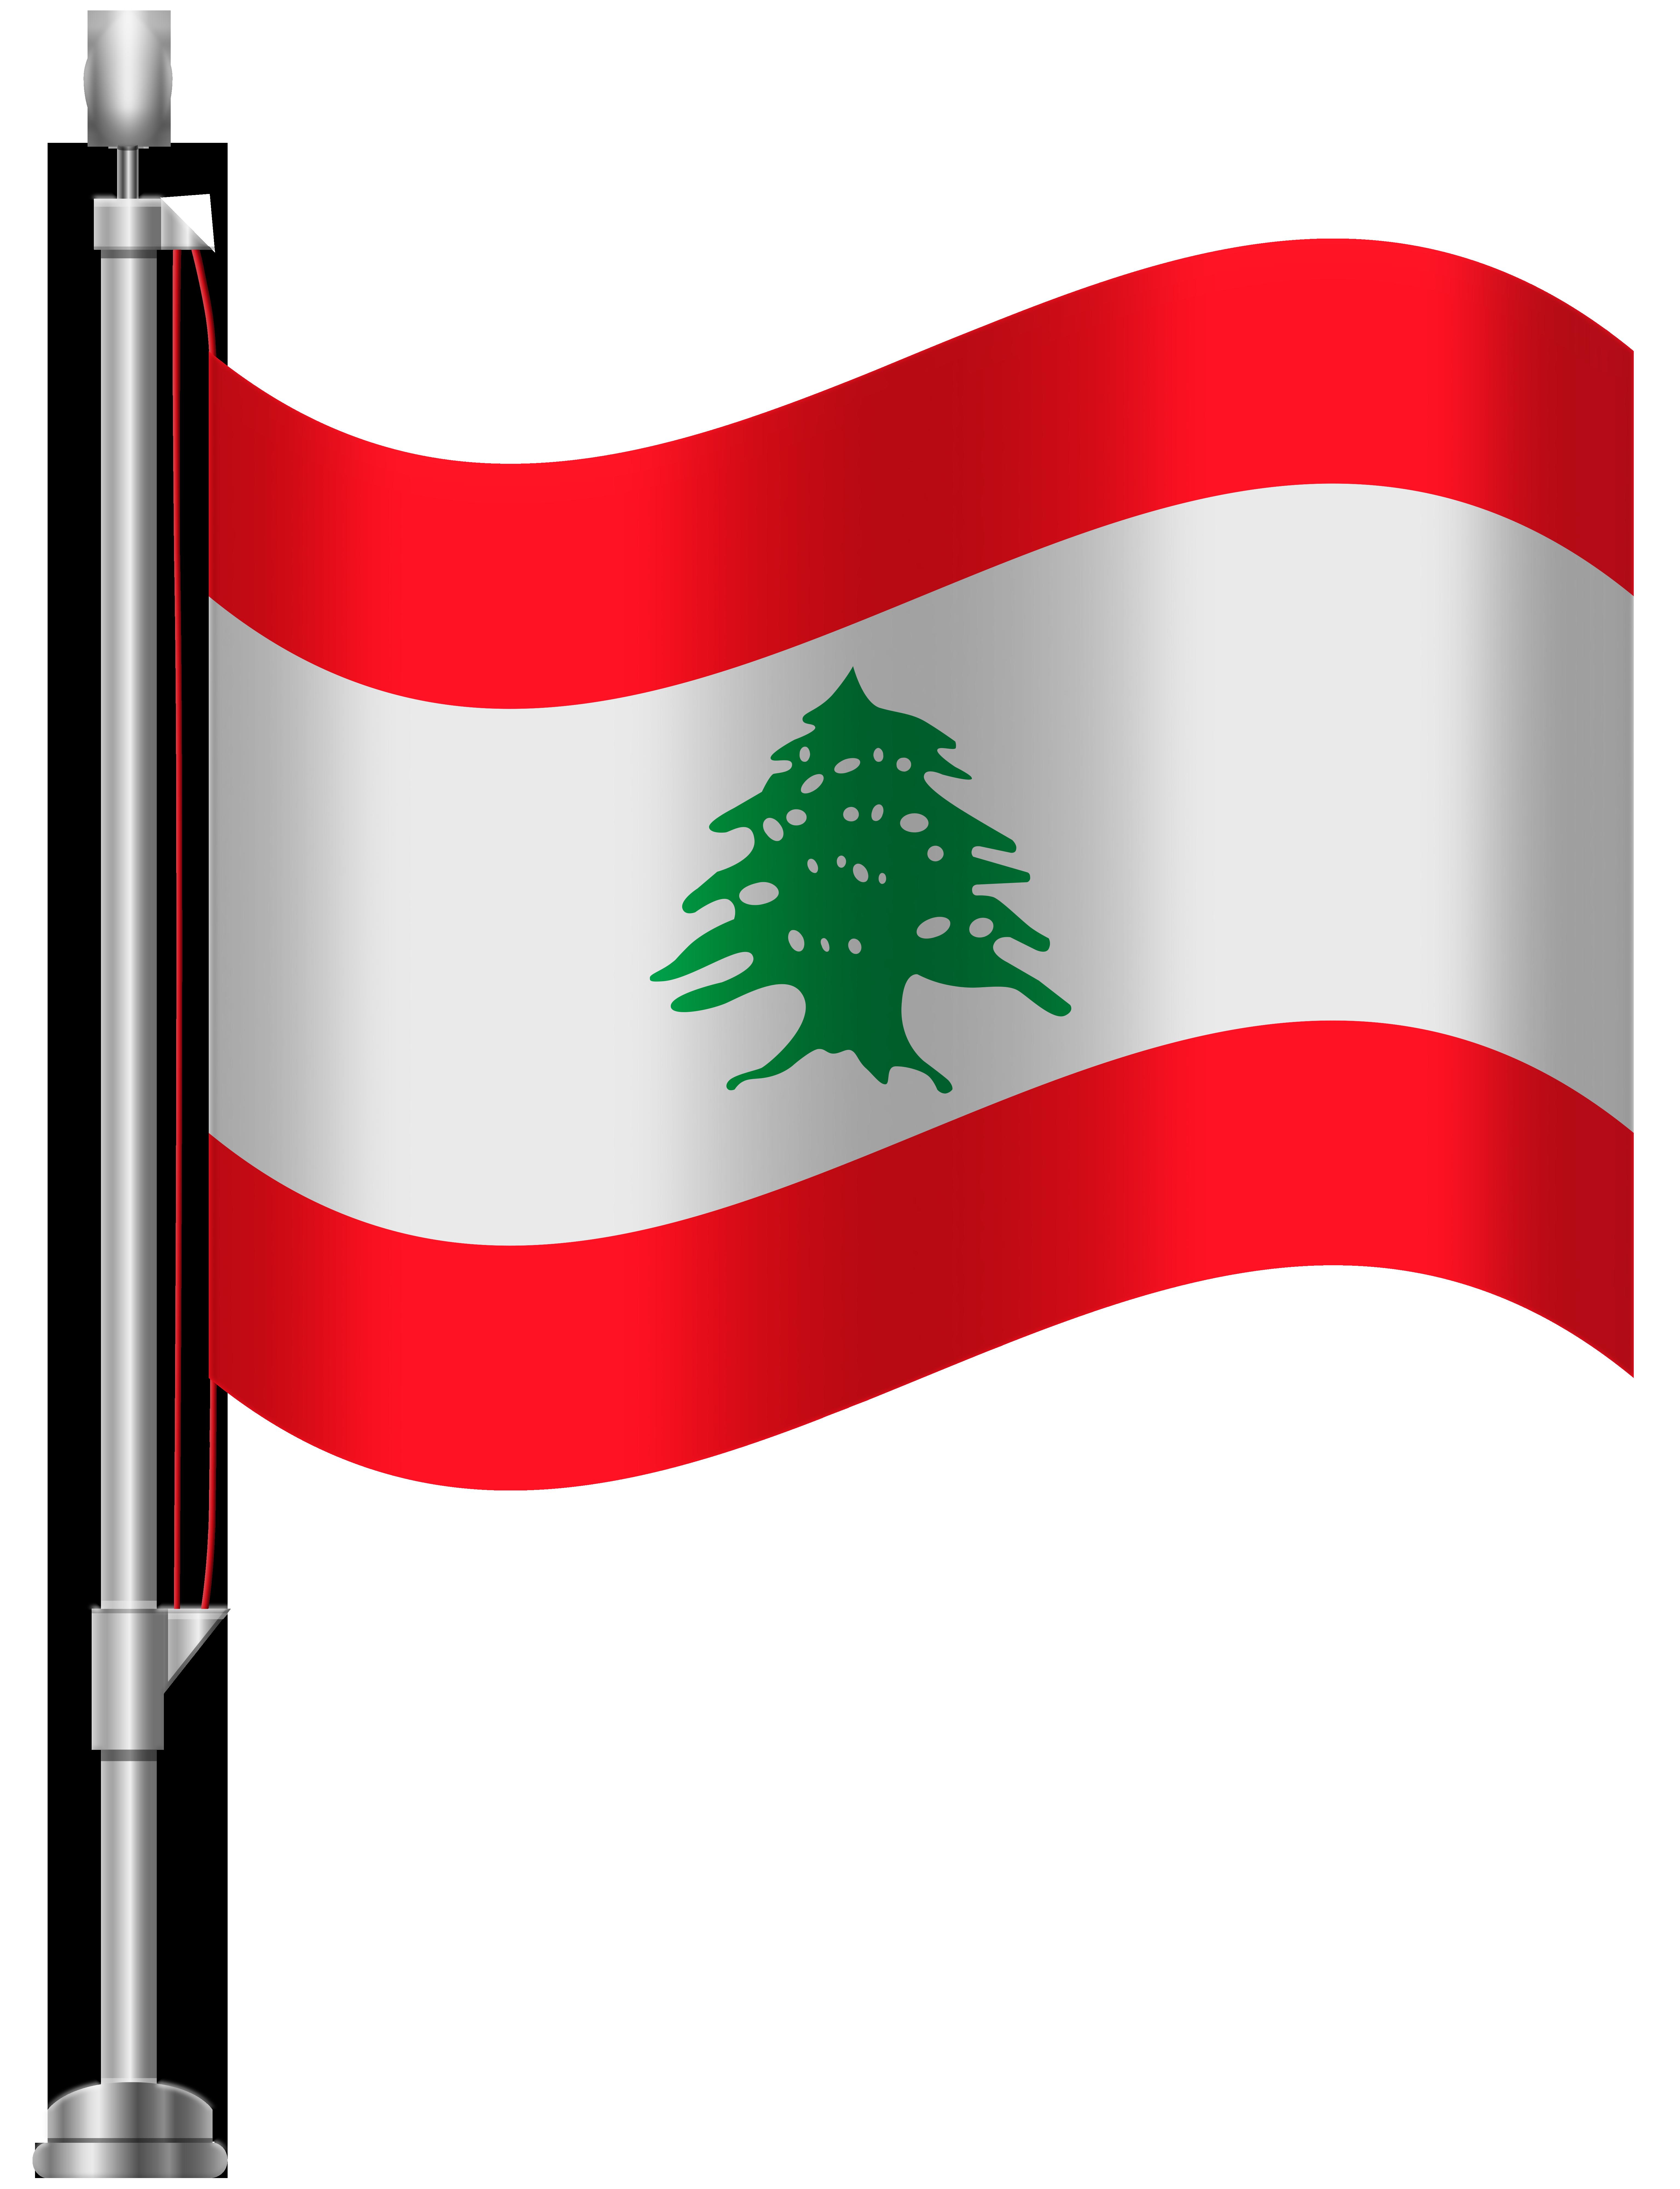 6141x8000 Lebanon Flag Png Clip Art